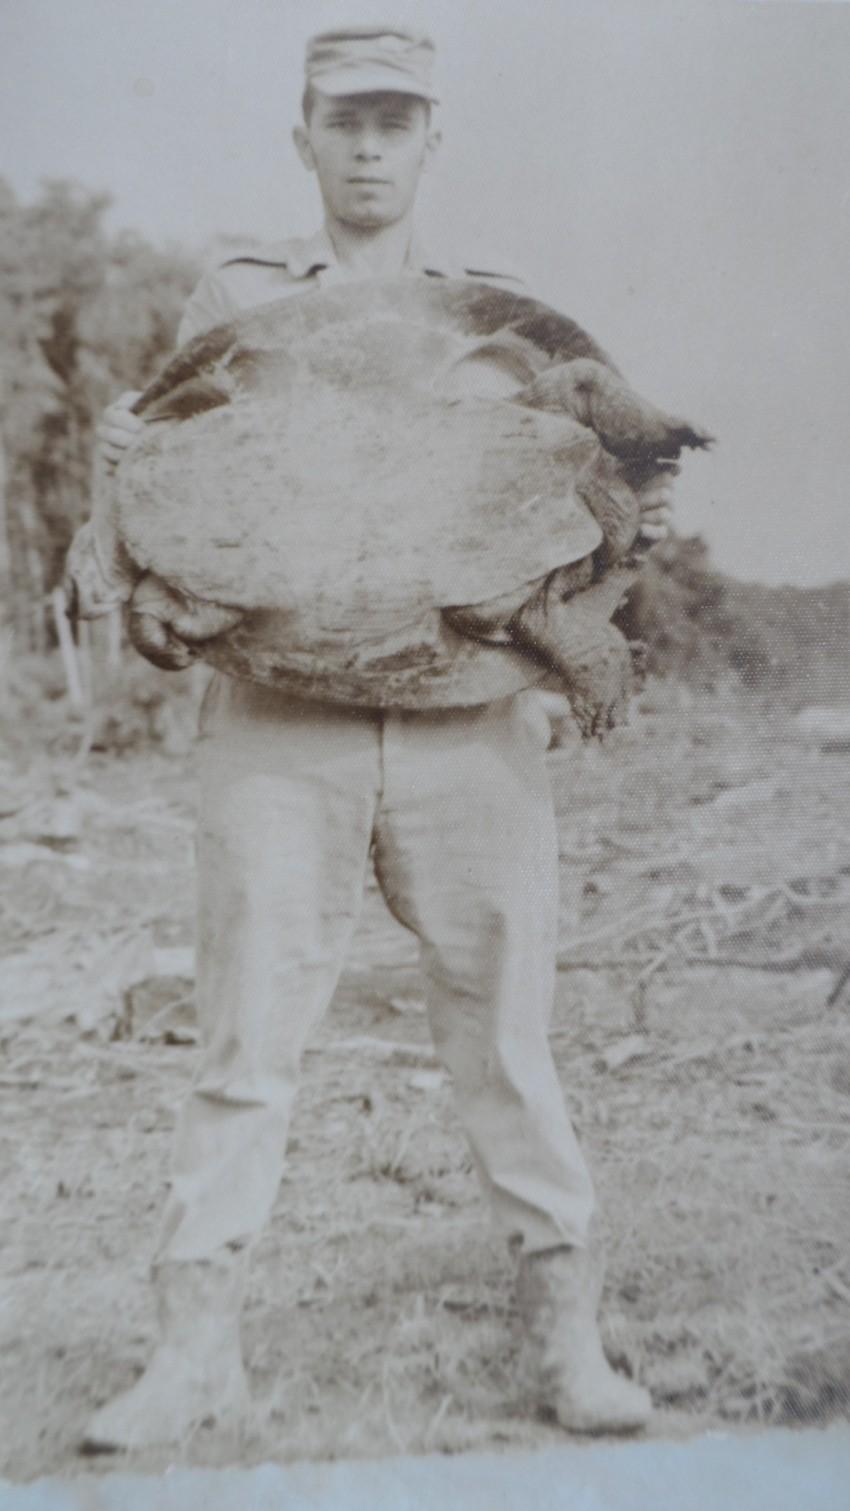 METRONOVELA – A MINHA! RUMO À MANAUS – parte 2